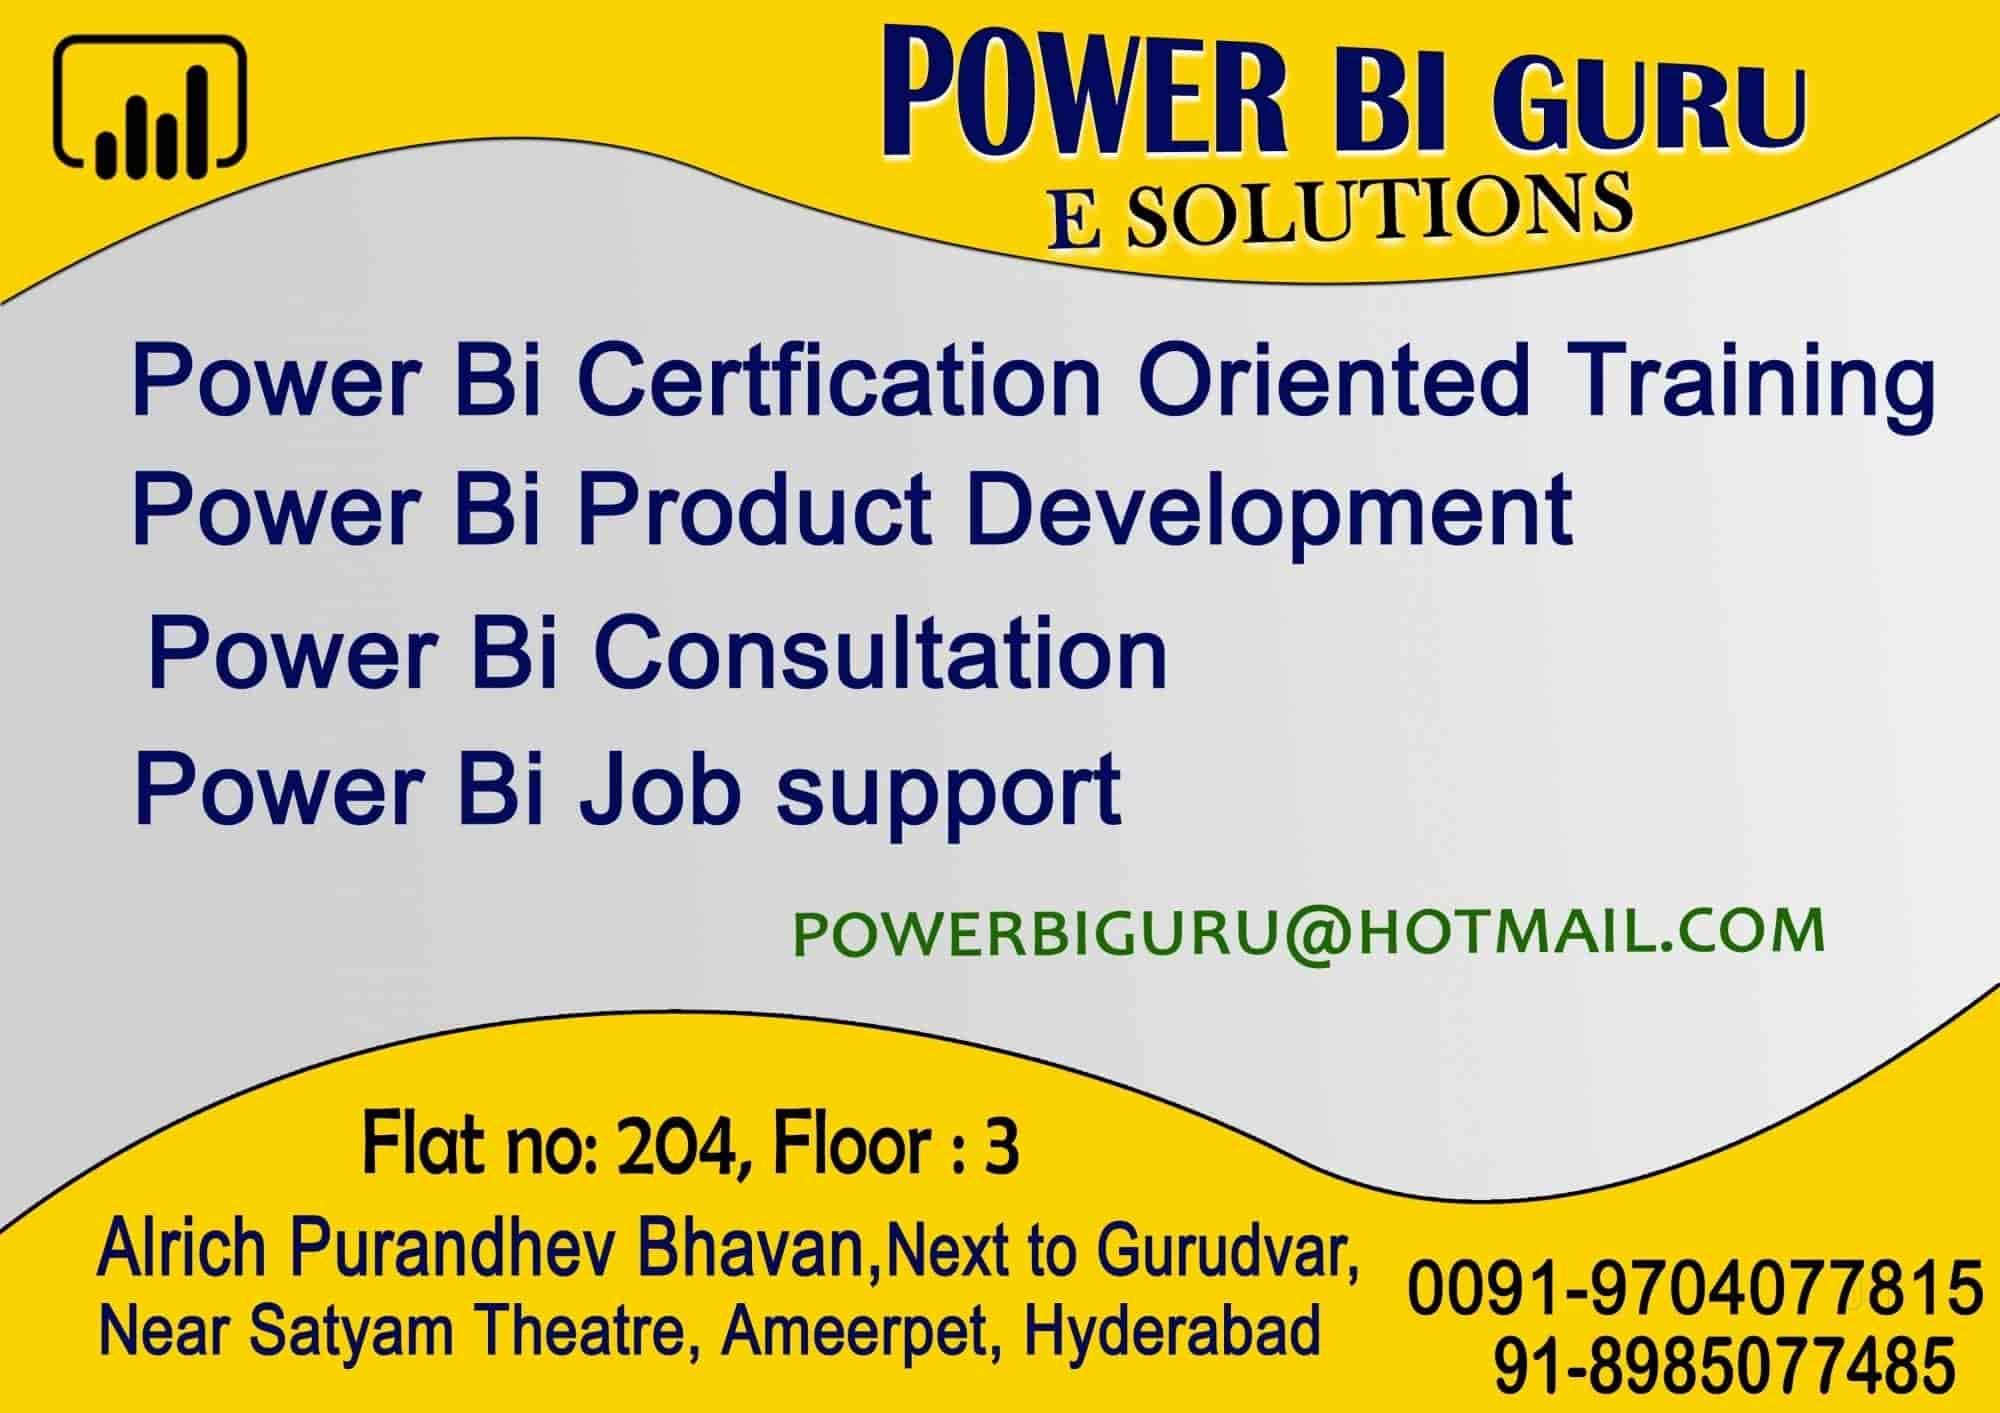 Power Bi Guru E Solutions Photos, Hinjawadi, Pune- Pictures